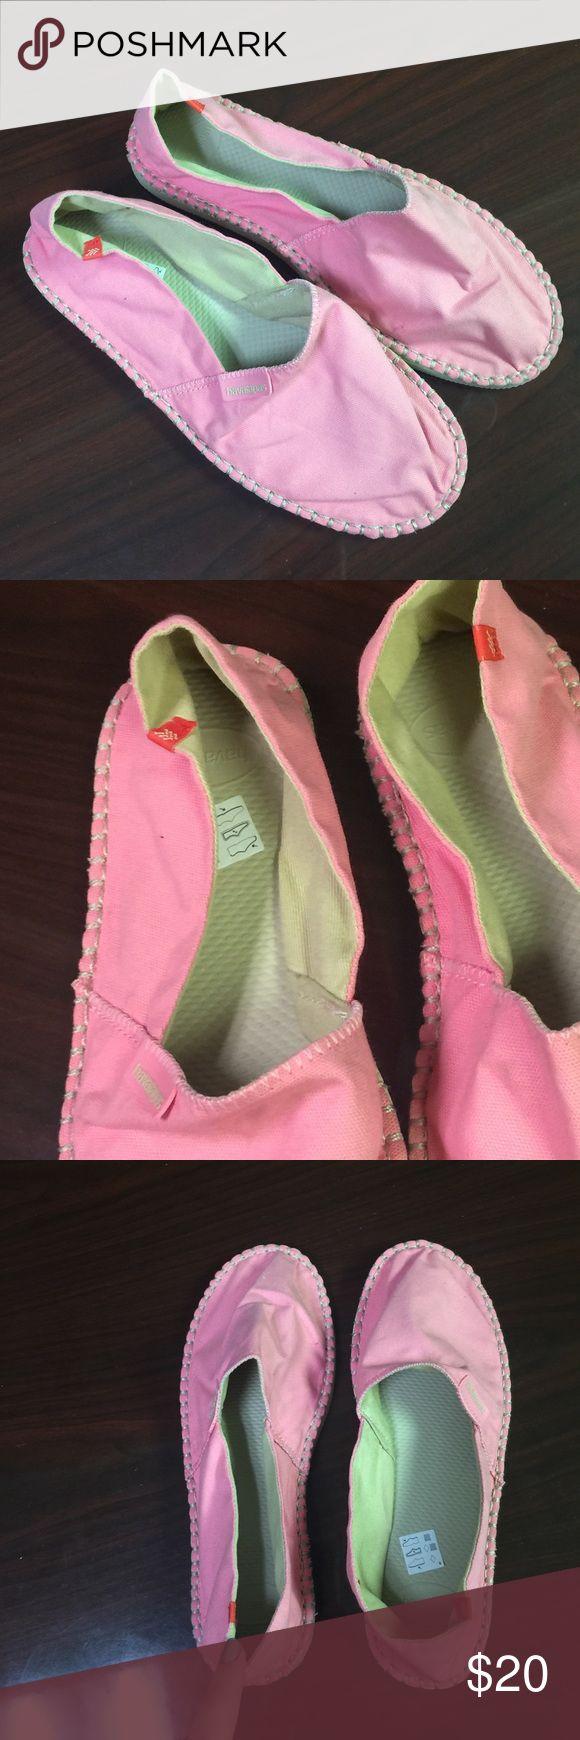 Havaianas Light Pink Espadrilles Size 39 Brand New/Never Worn Havaianas Shoes Espadrilles